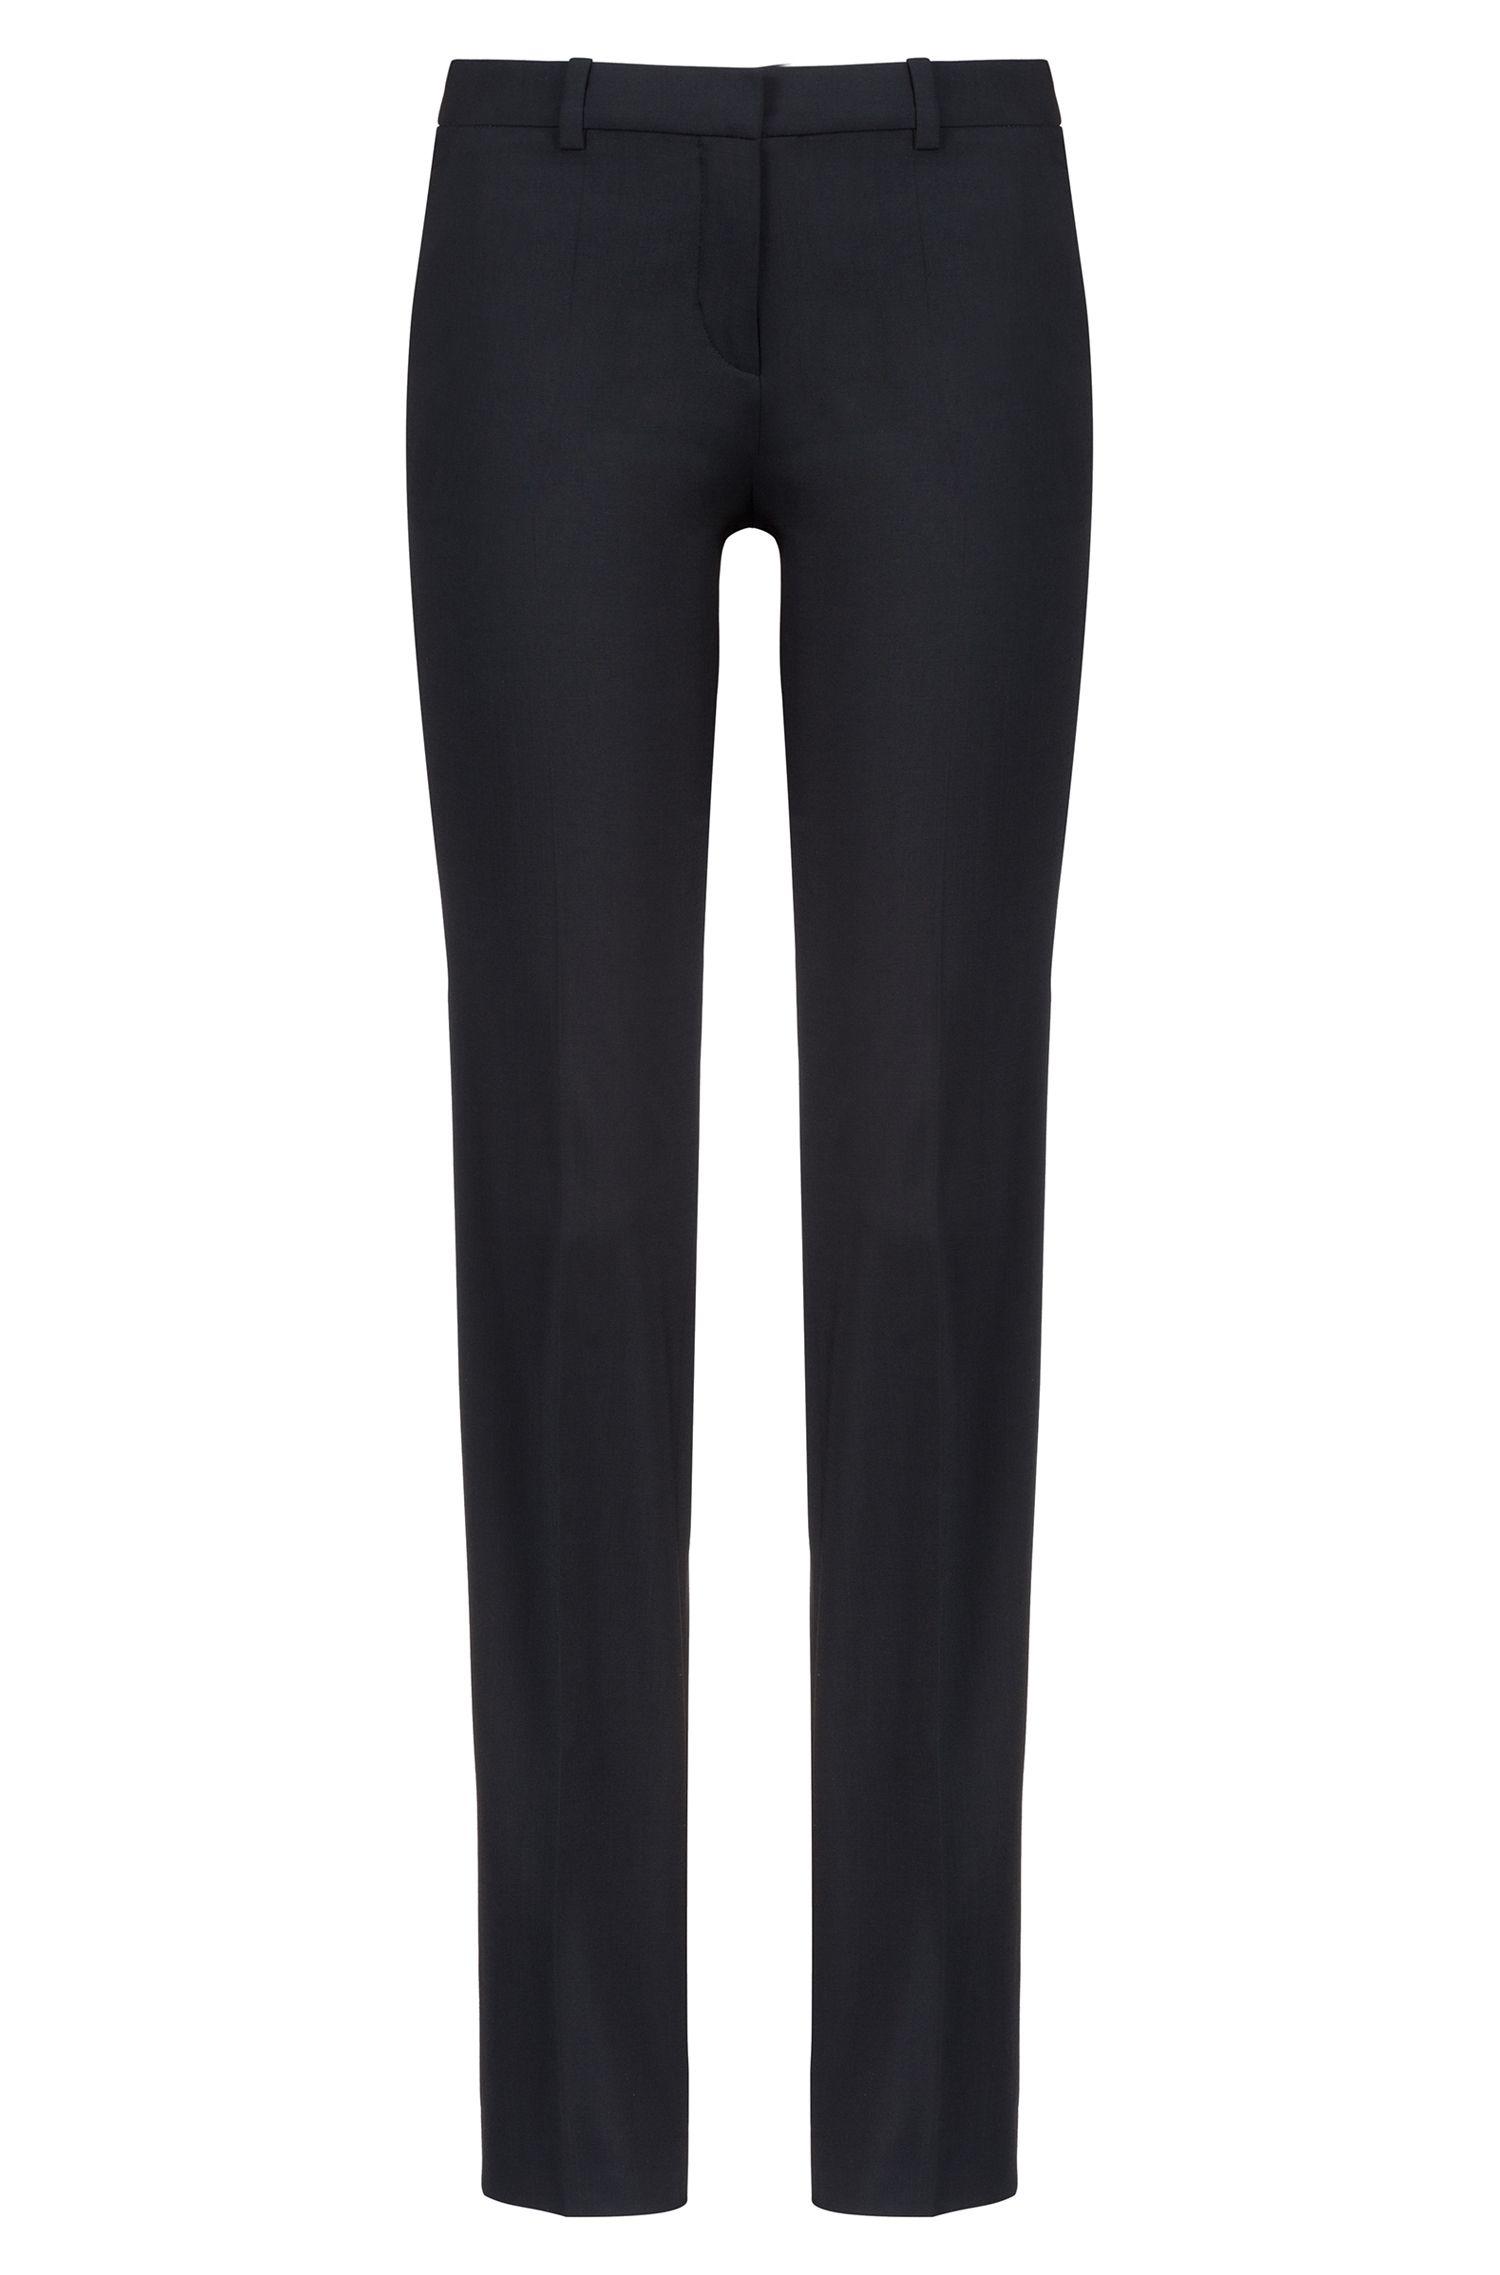 Pantalon HUGO Femme Regular Fit habillé, en laine vierge stretch